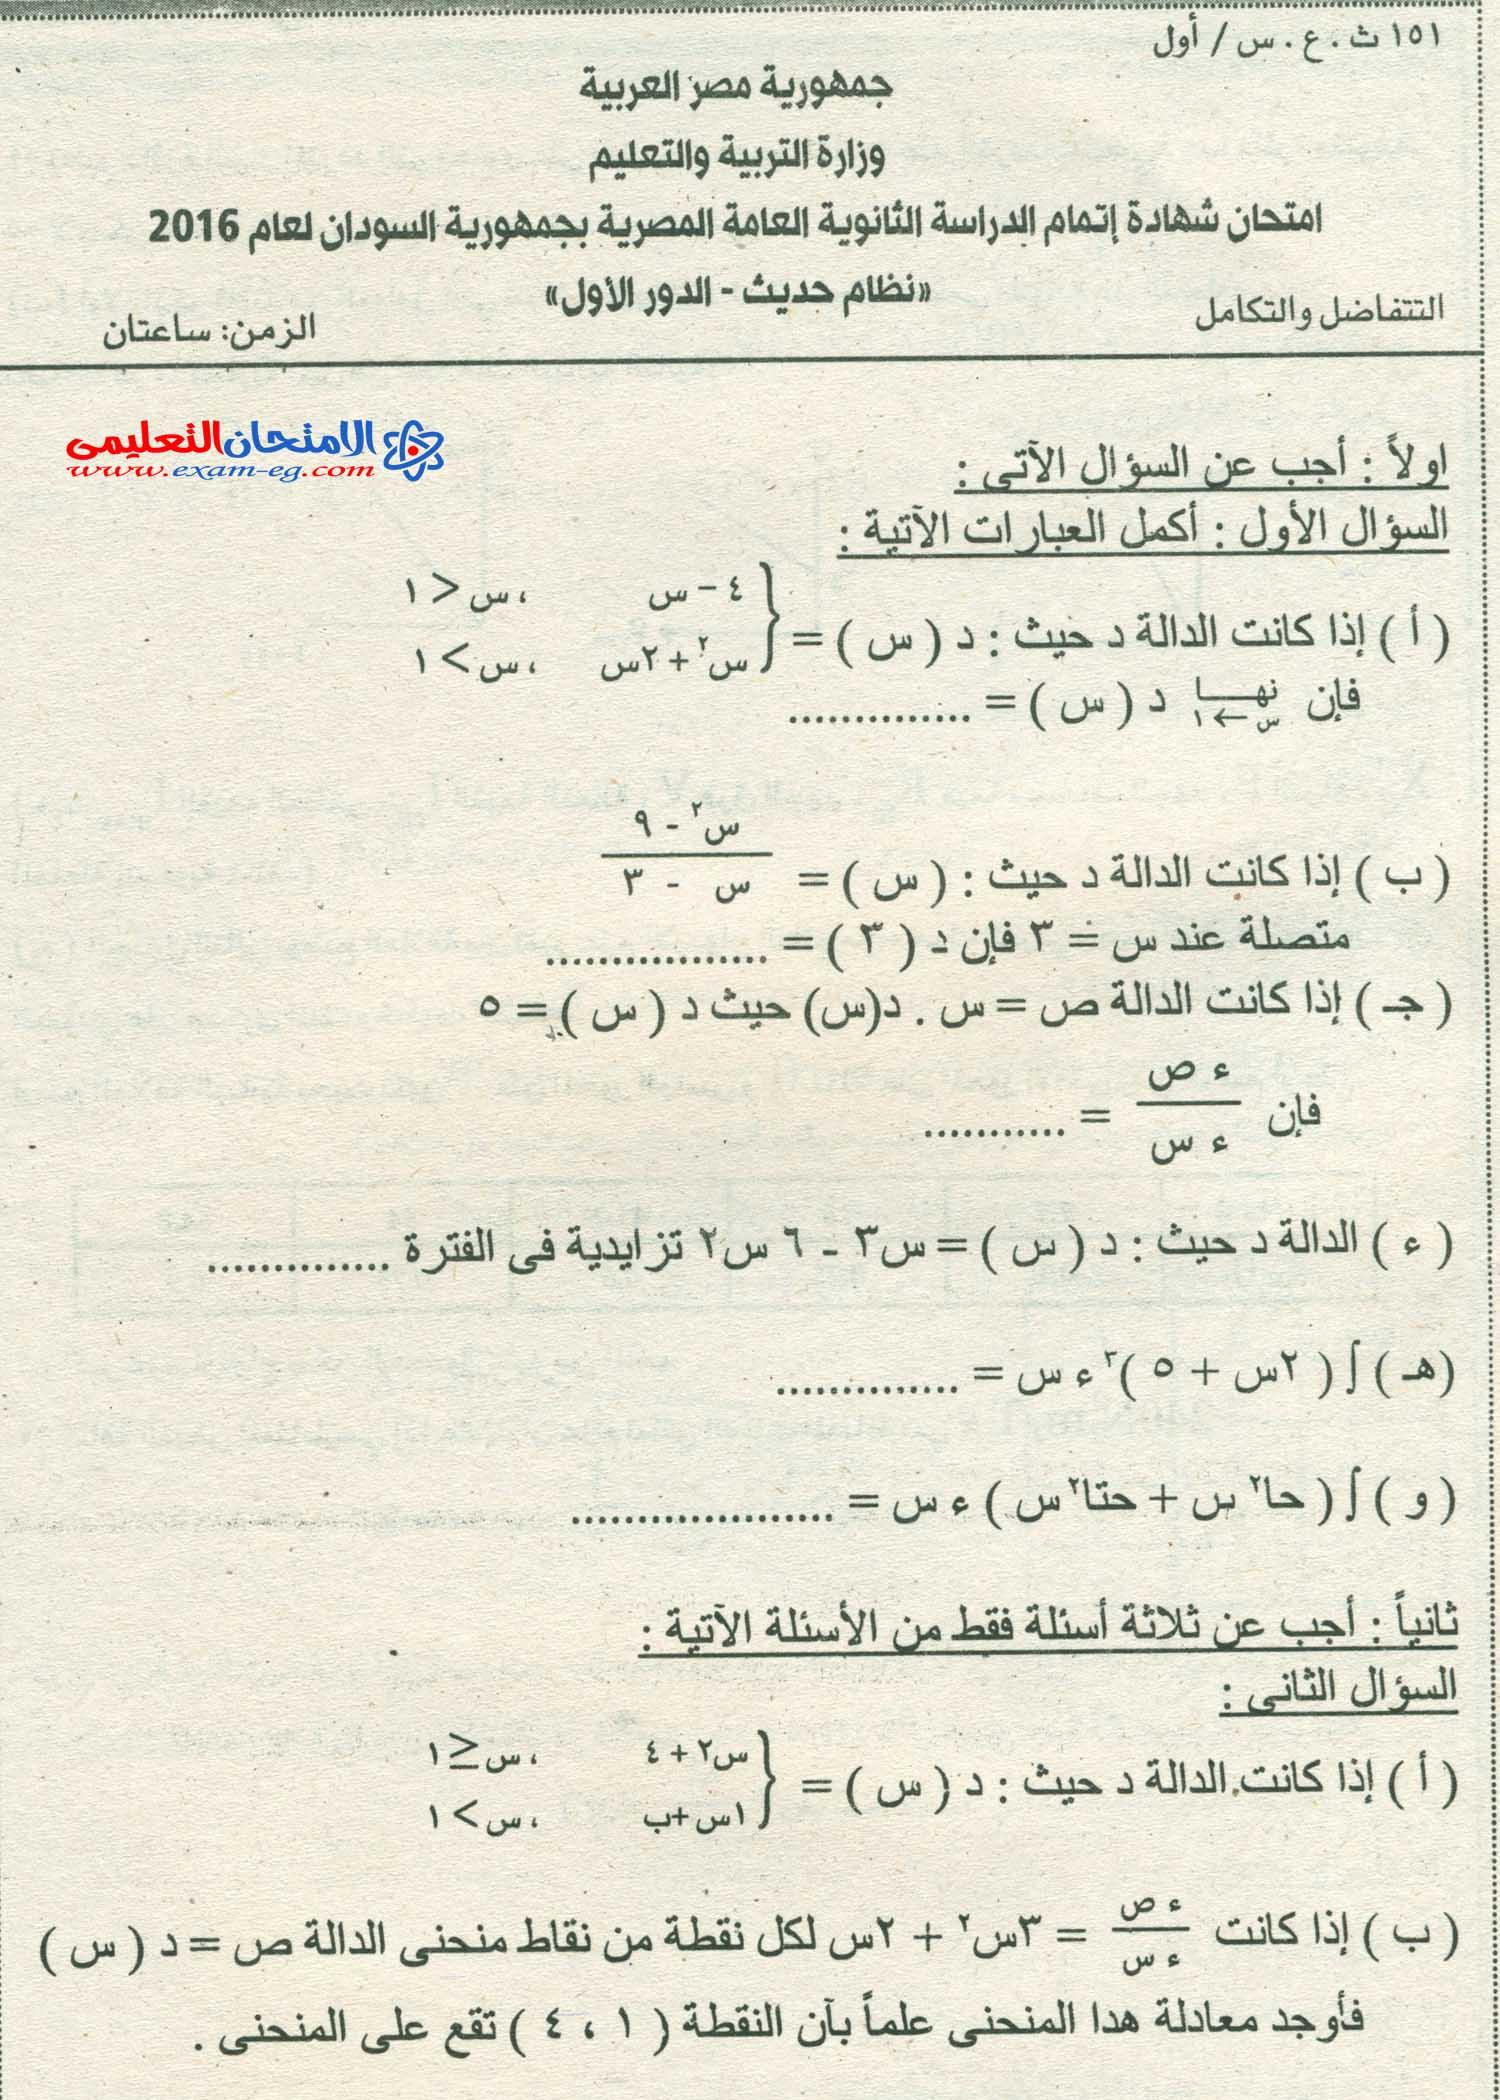 exam-eg.com_1461100089421.jpg